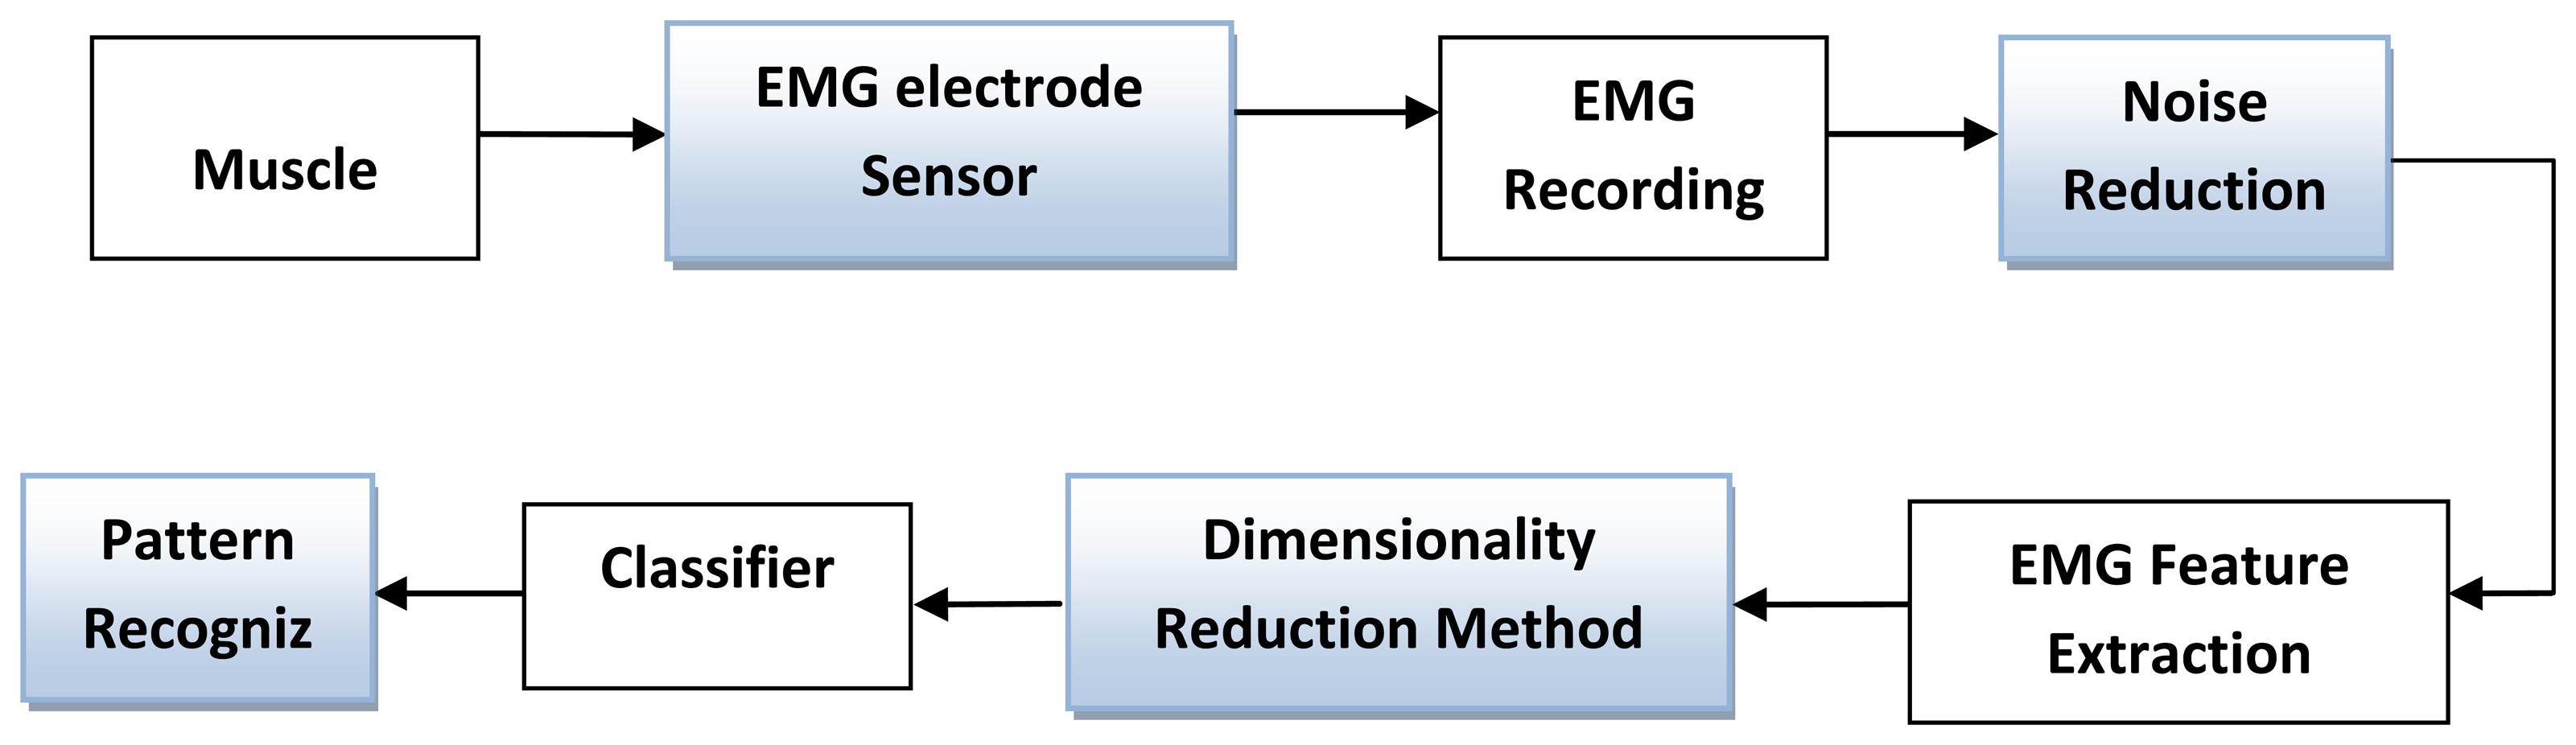 Emg Pickup Wiring Diagrams Diagram Libraries Pickups Schematics Block Data Todayemg Third Level